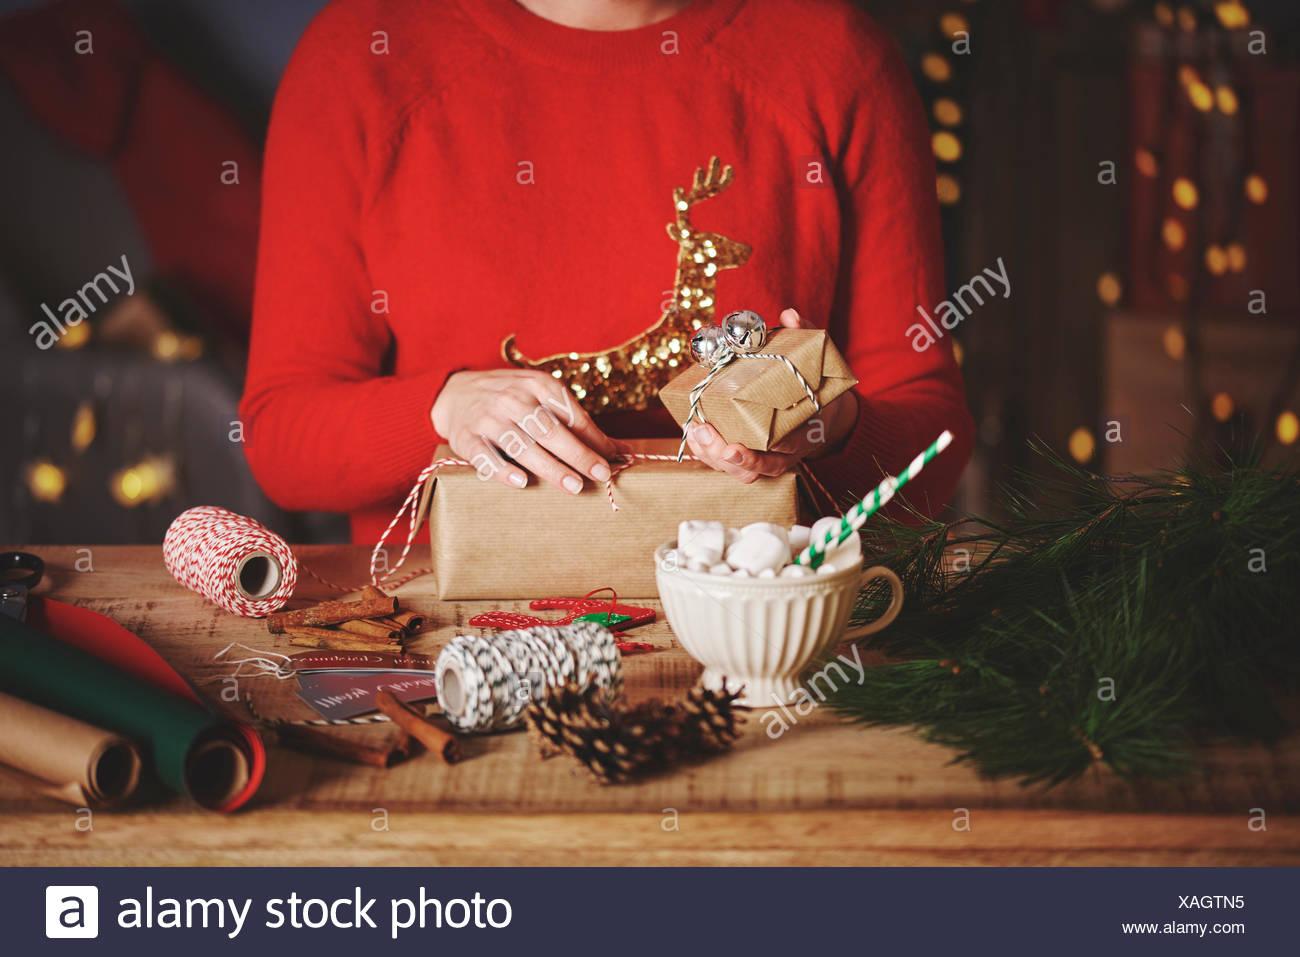 Woman wrapping christmas gifts Stock Photo: 281883089 - Alamy